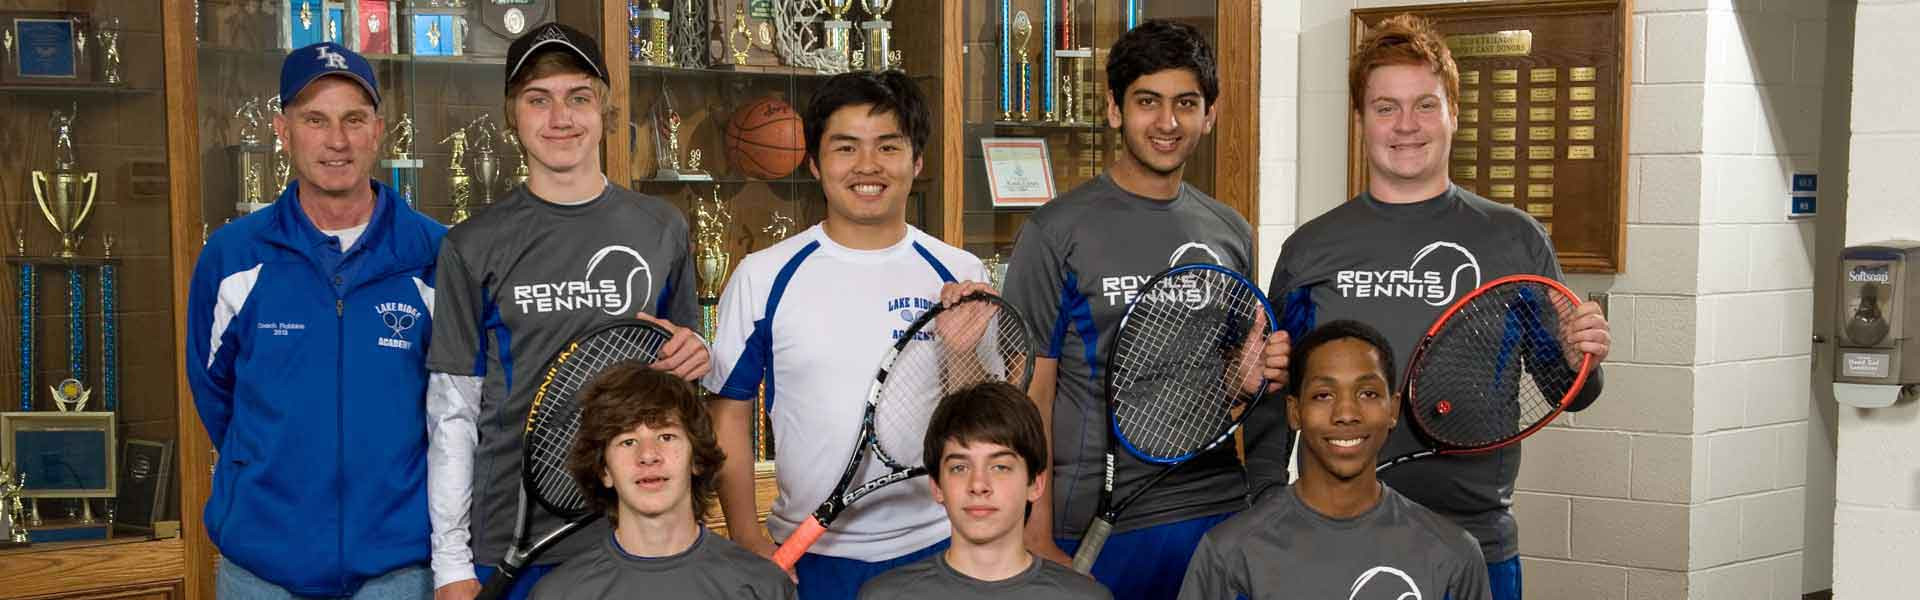 LakeRidge-Highschool-OH-Tennis-MAin-BAnner